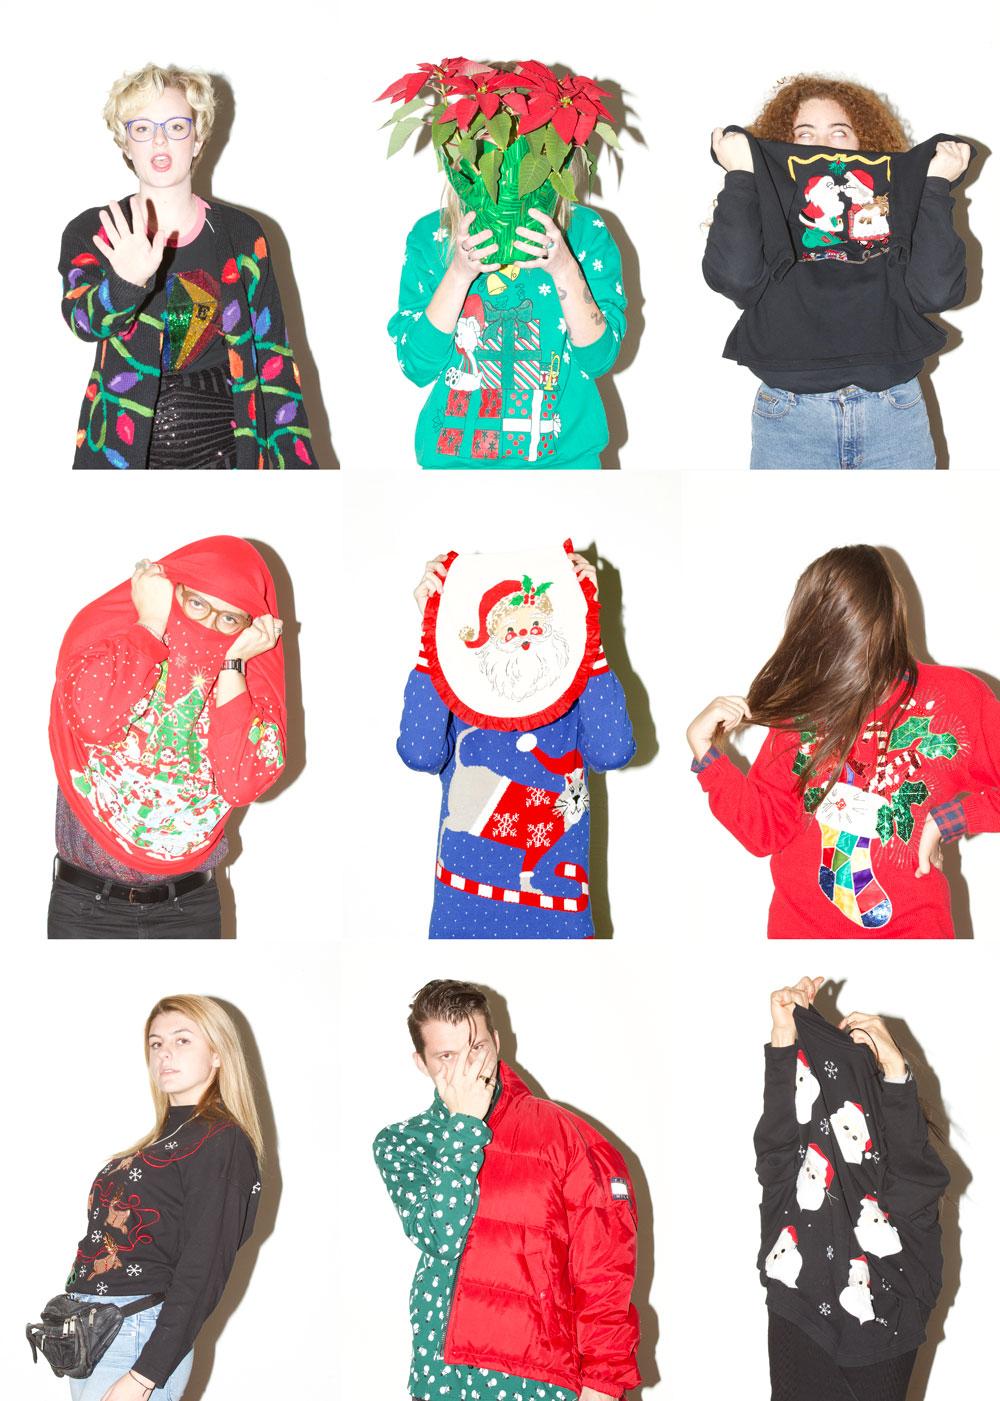 Smells like Christmas Spirit.  Caralyn Clark, Amanda Mosher, Keana Frierson, Mikey Massas, Will Bassler, Kaitlyn Higby, Hannah Morel, Jon Jackson, and Flower Ta.